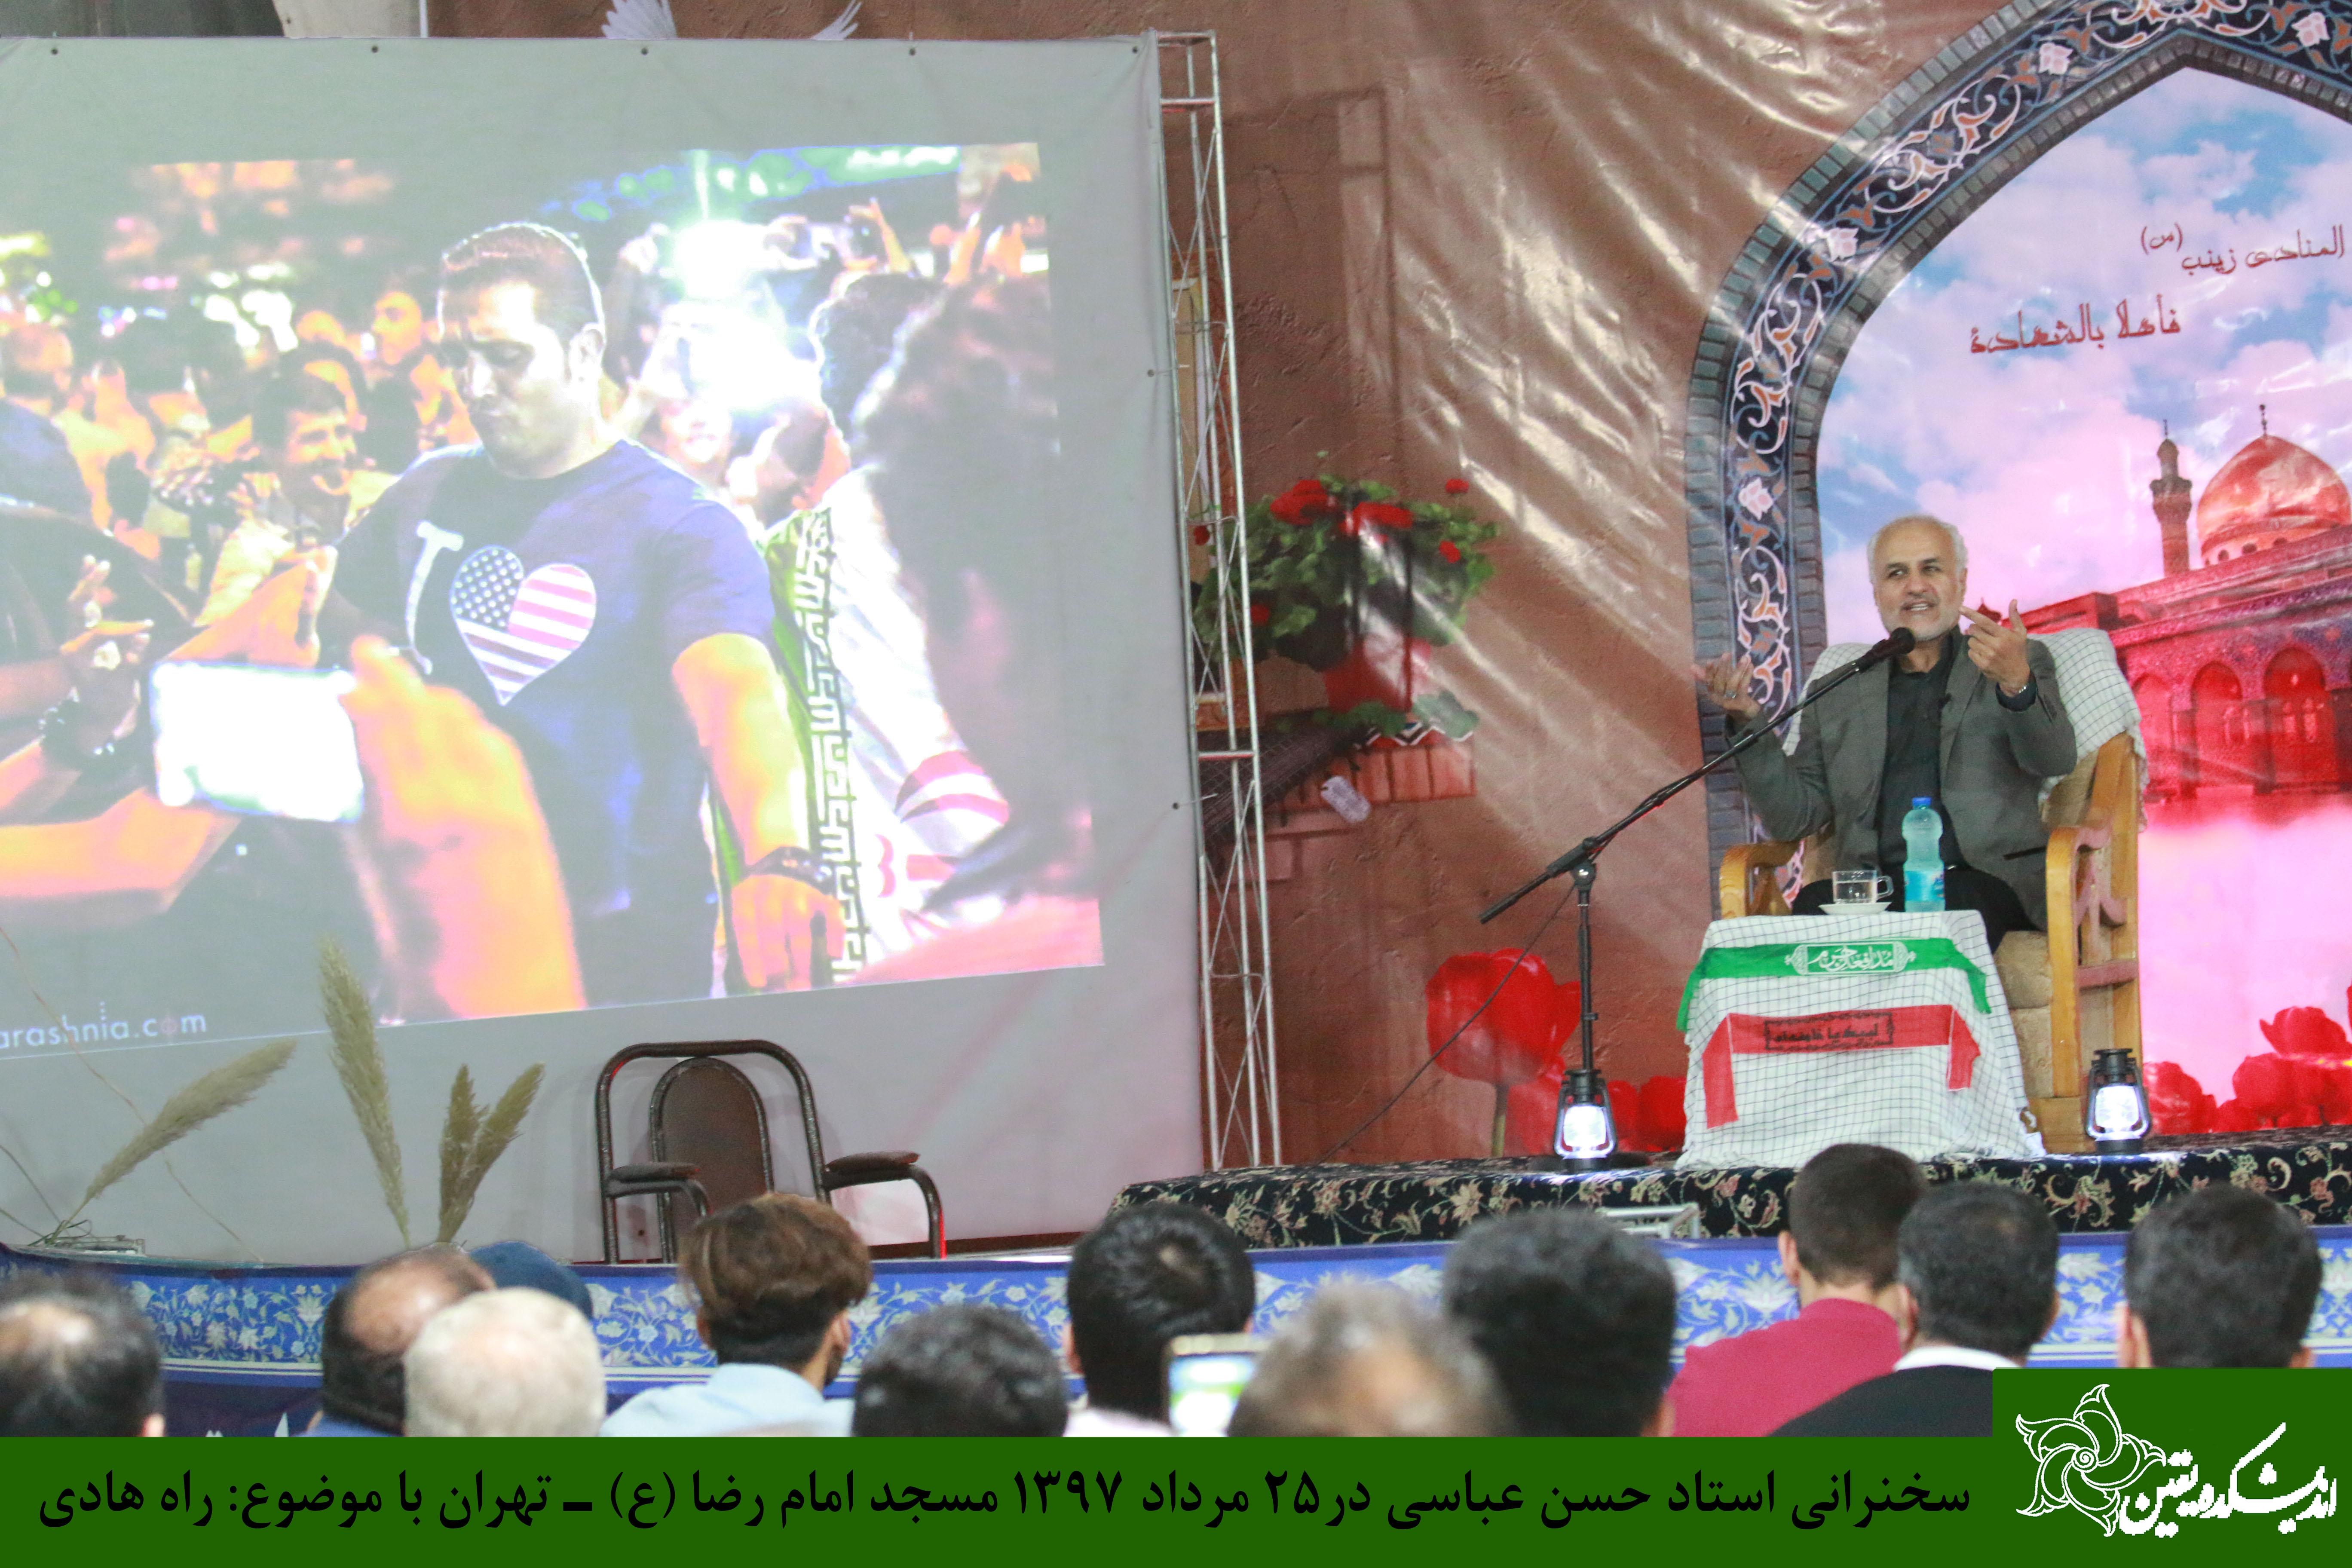 IMG 970525%20%286%29 نقل از تصویری؛ سخنرانی استاد حسن عباسی با موضوع راه هادی